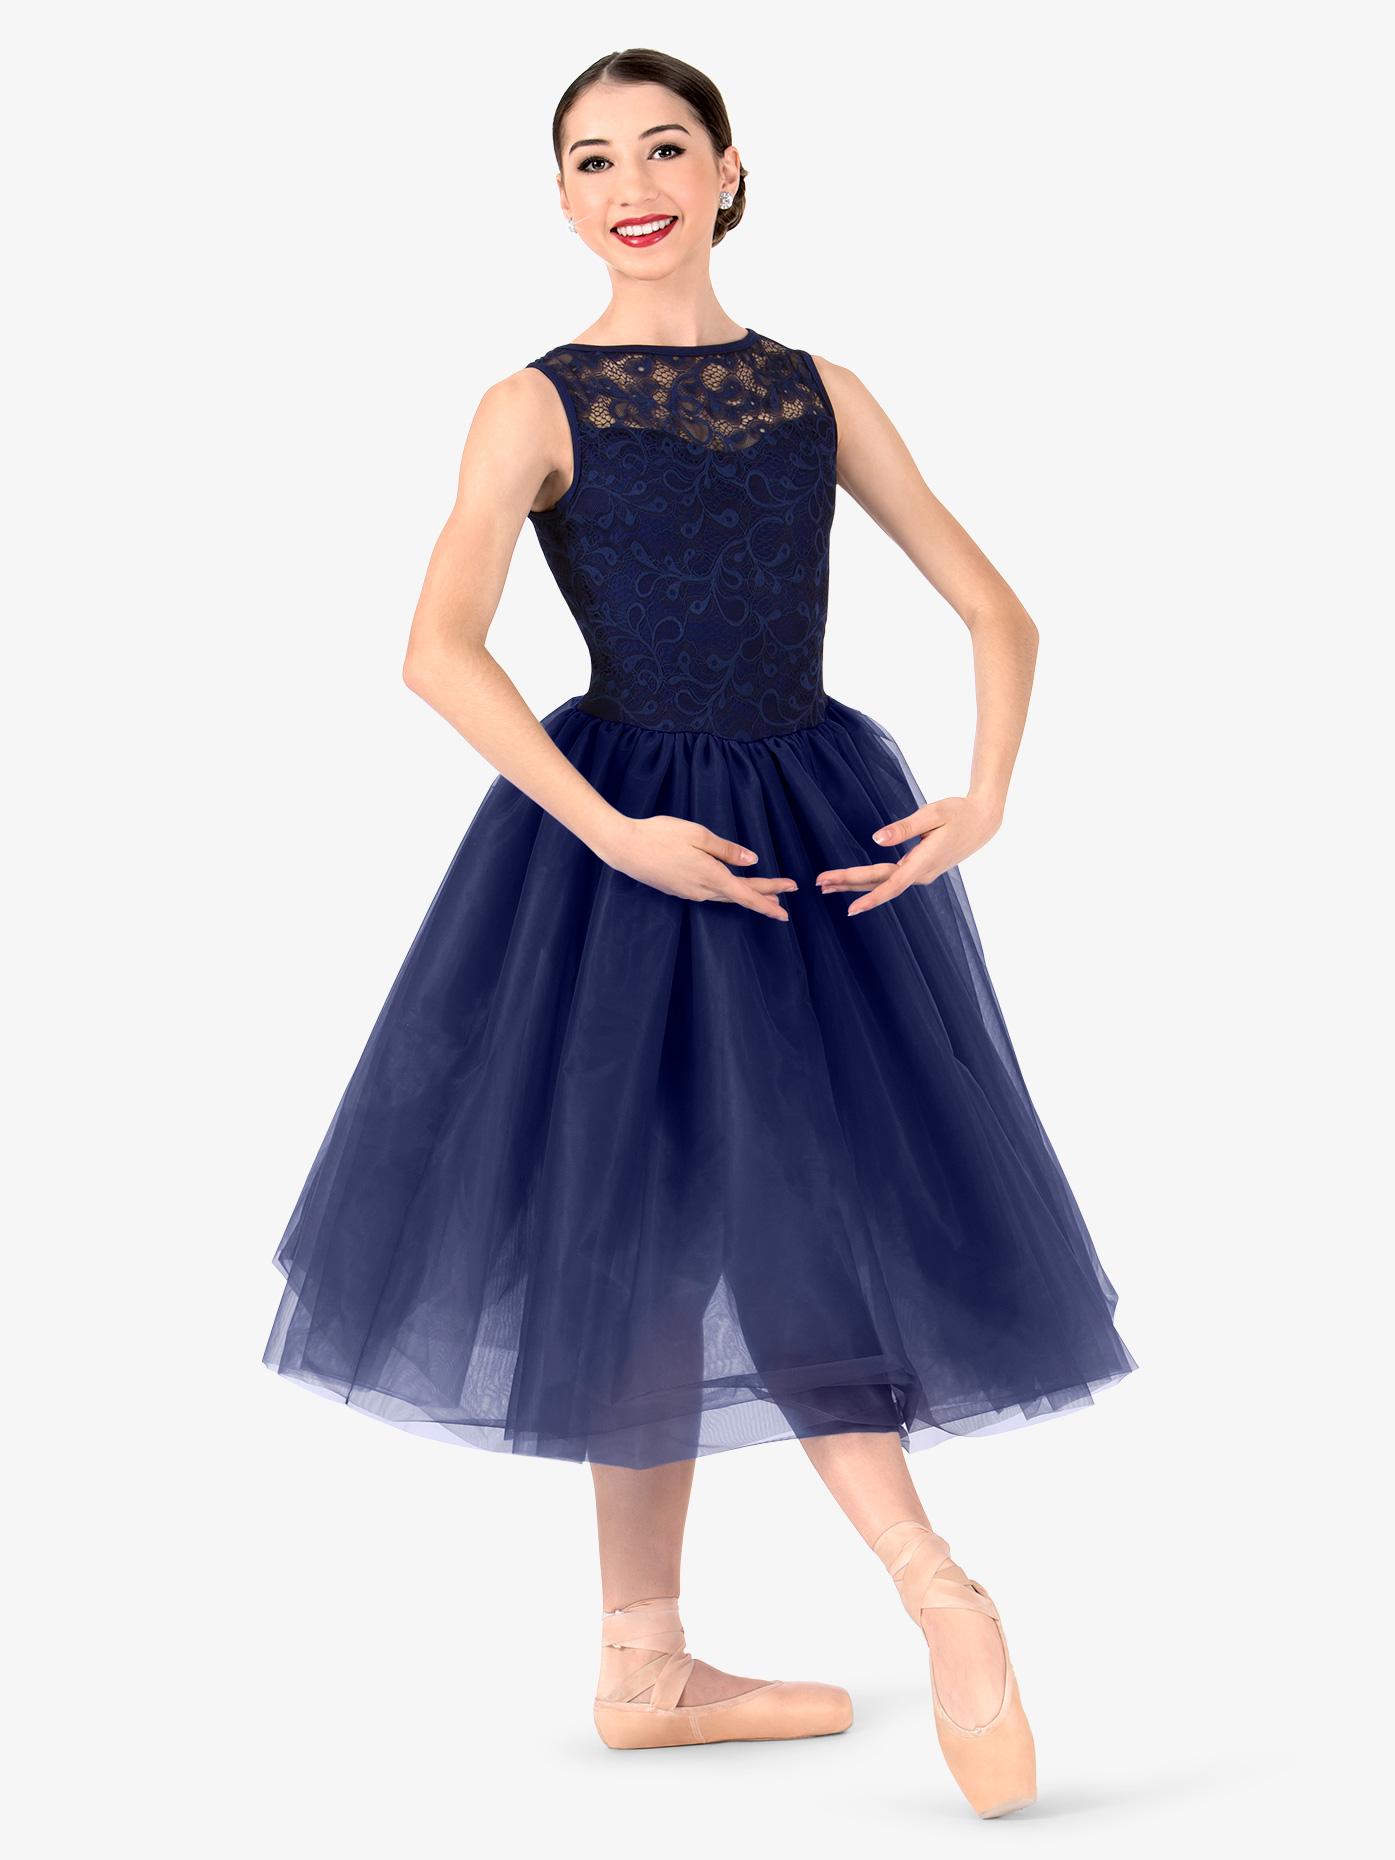 Elisse by Double Platinum Womens Plus Size Lace Overlay Ballet Tutu Dress N7481P